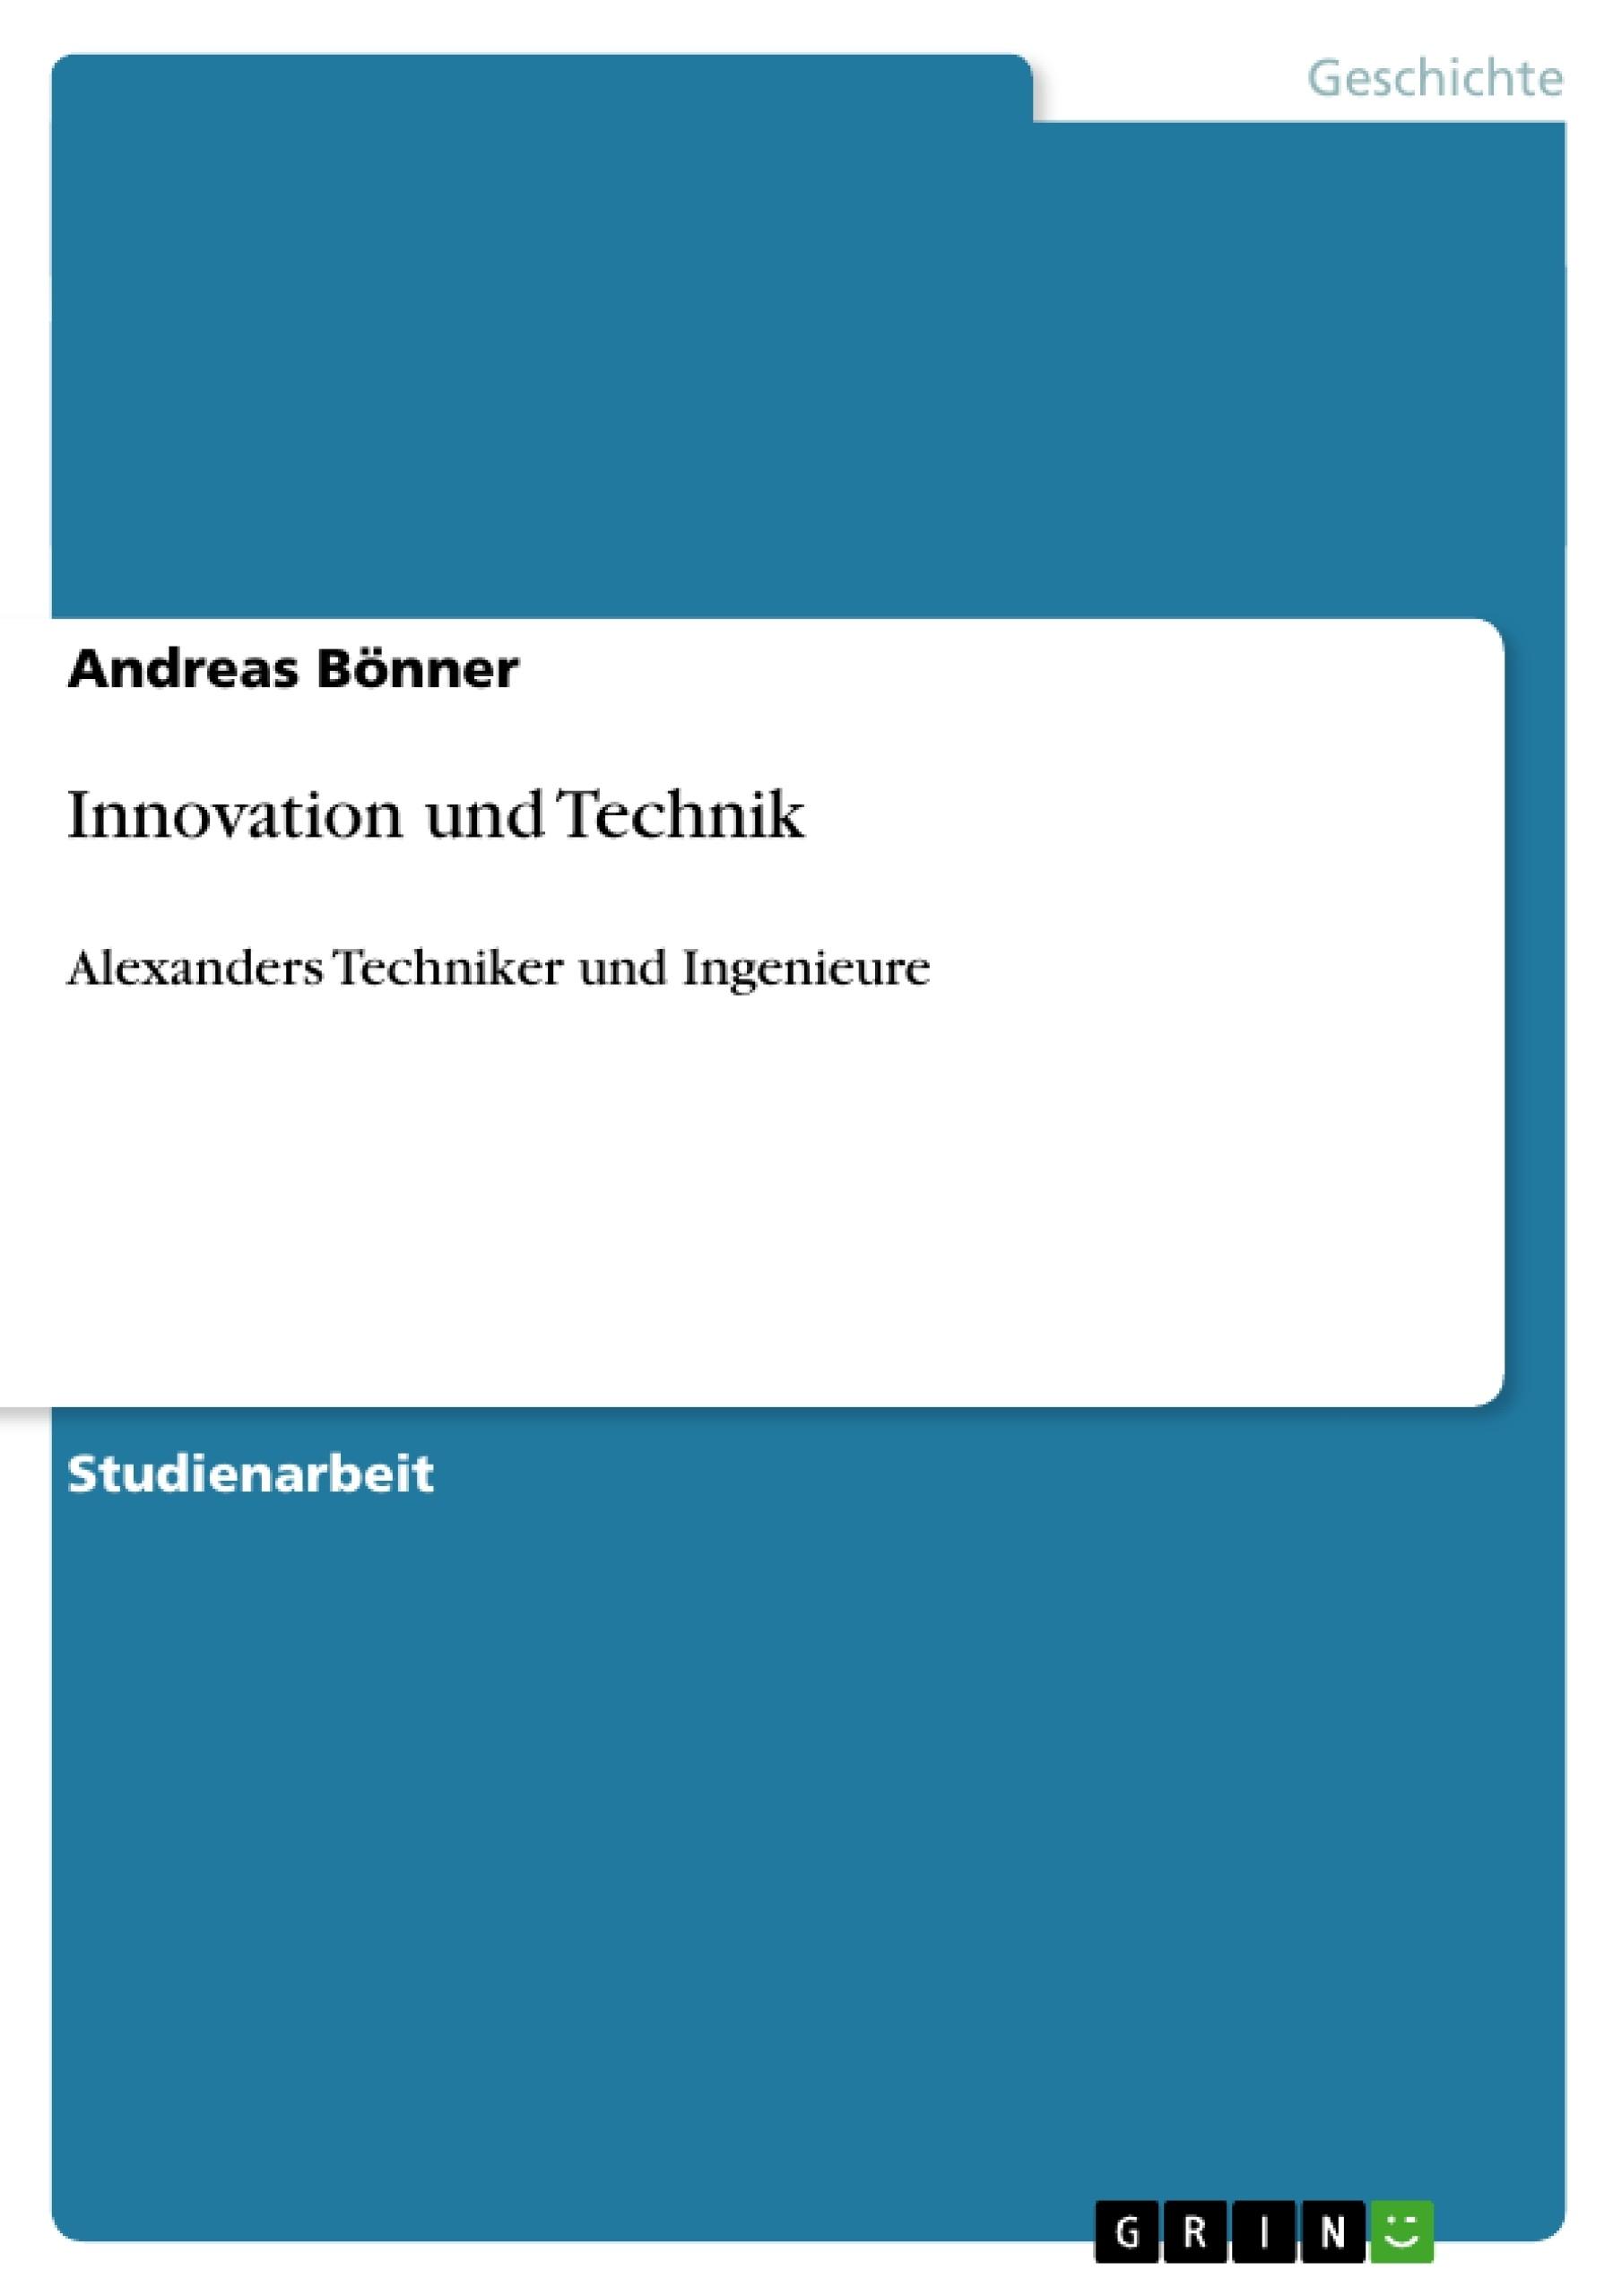 Titel: Innovation und Technik